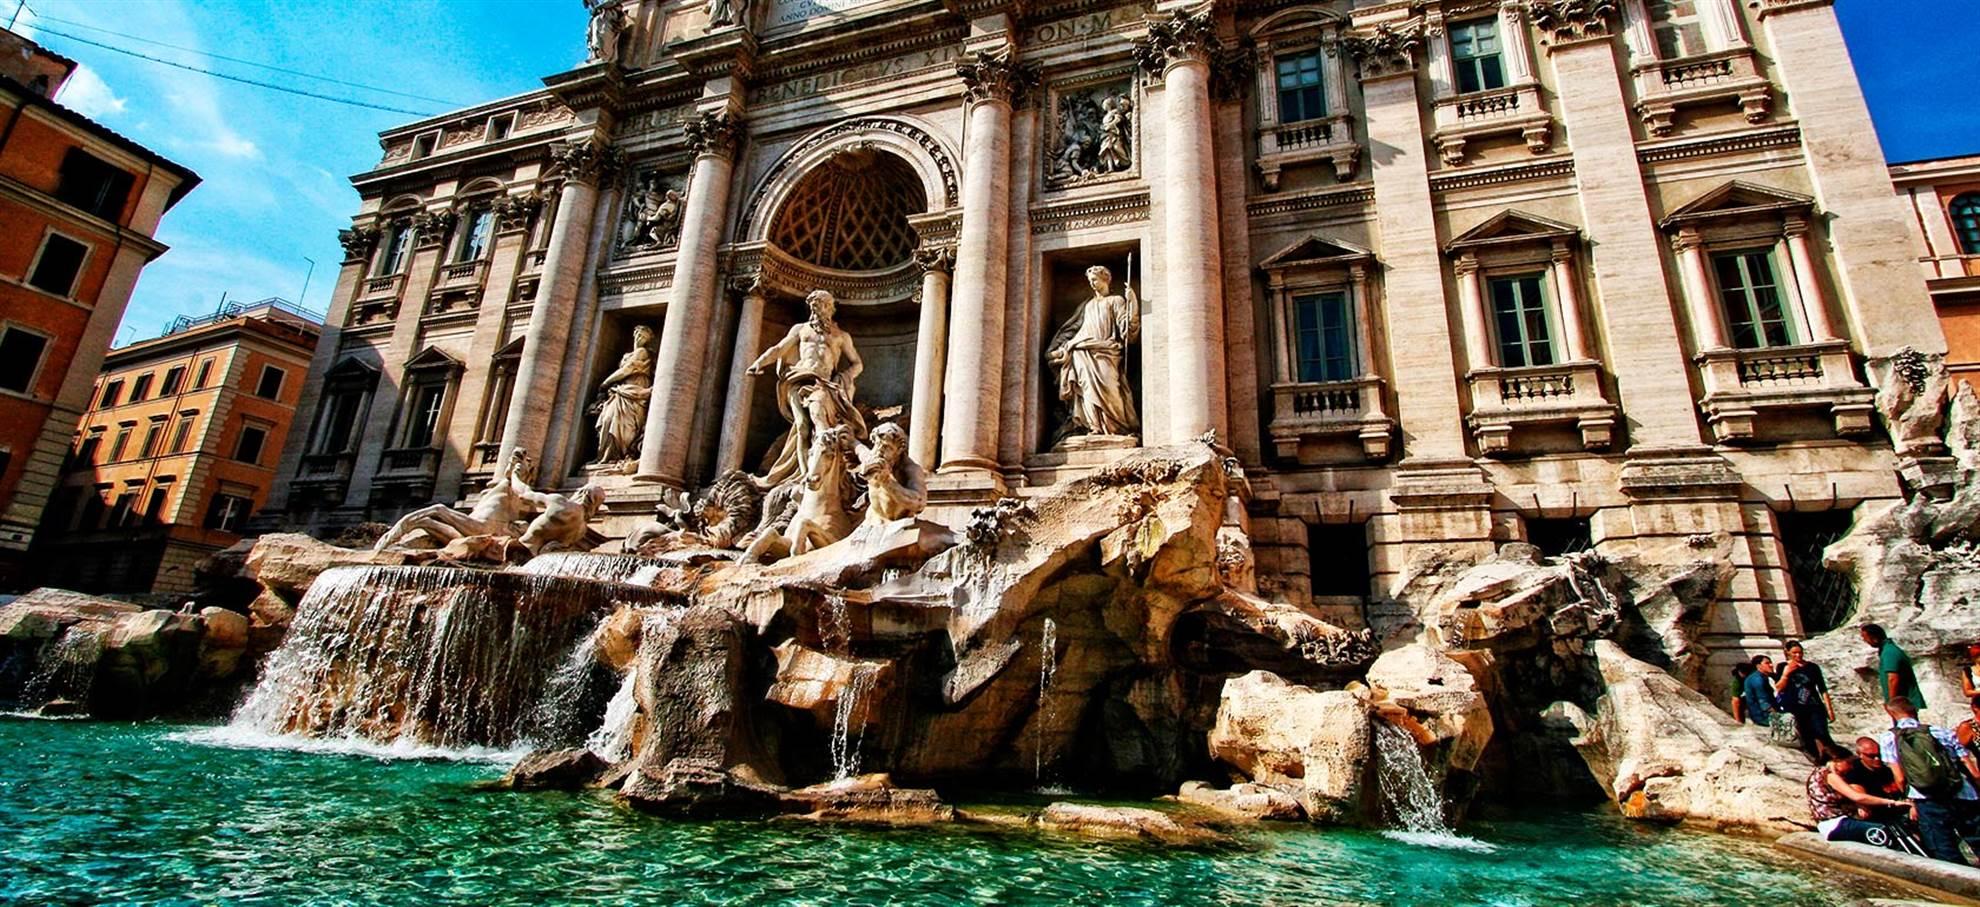 Panteon, Trevi-fontænen & det Barokke Rom